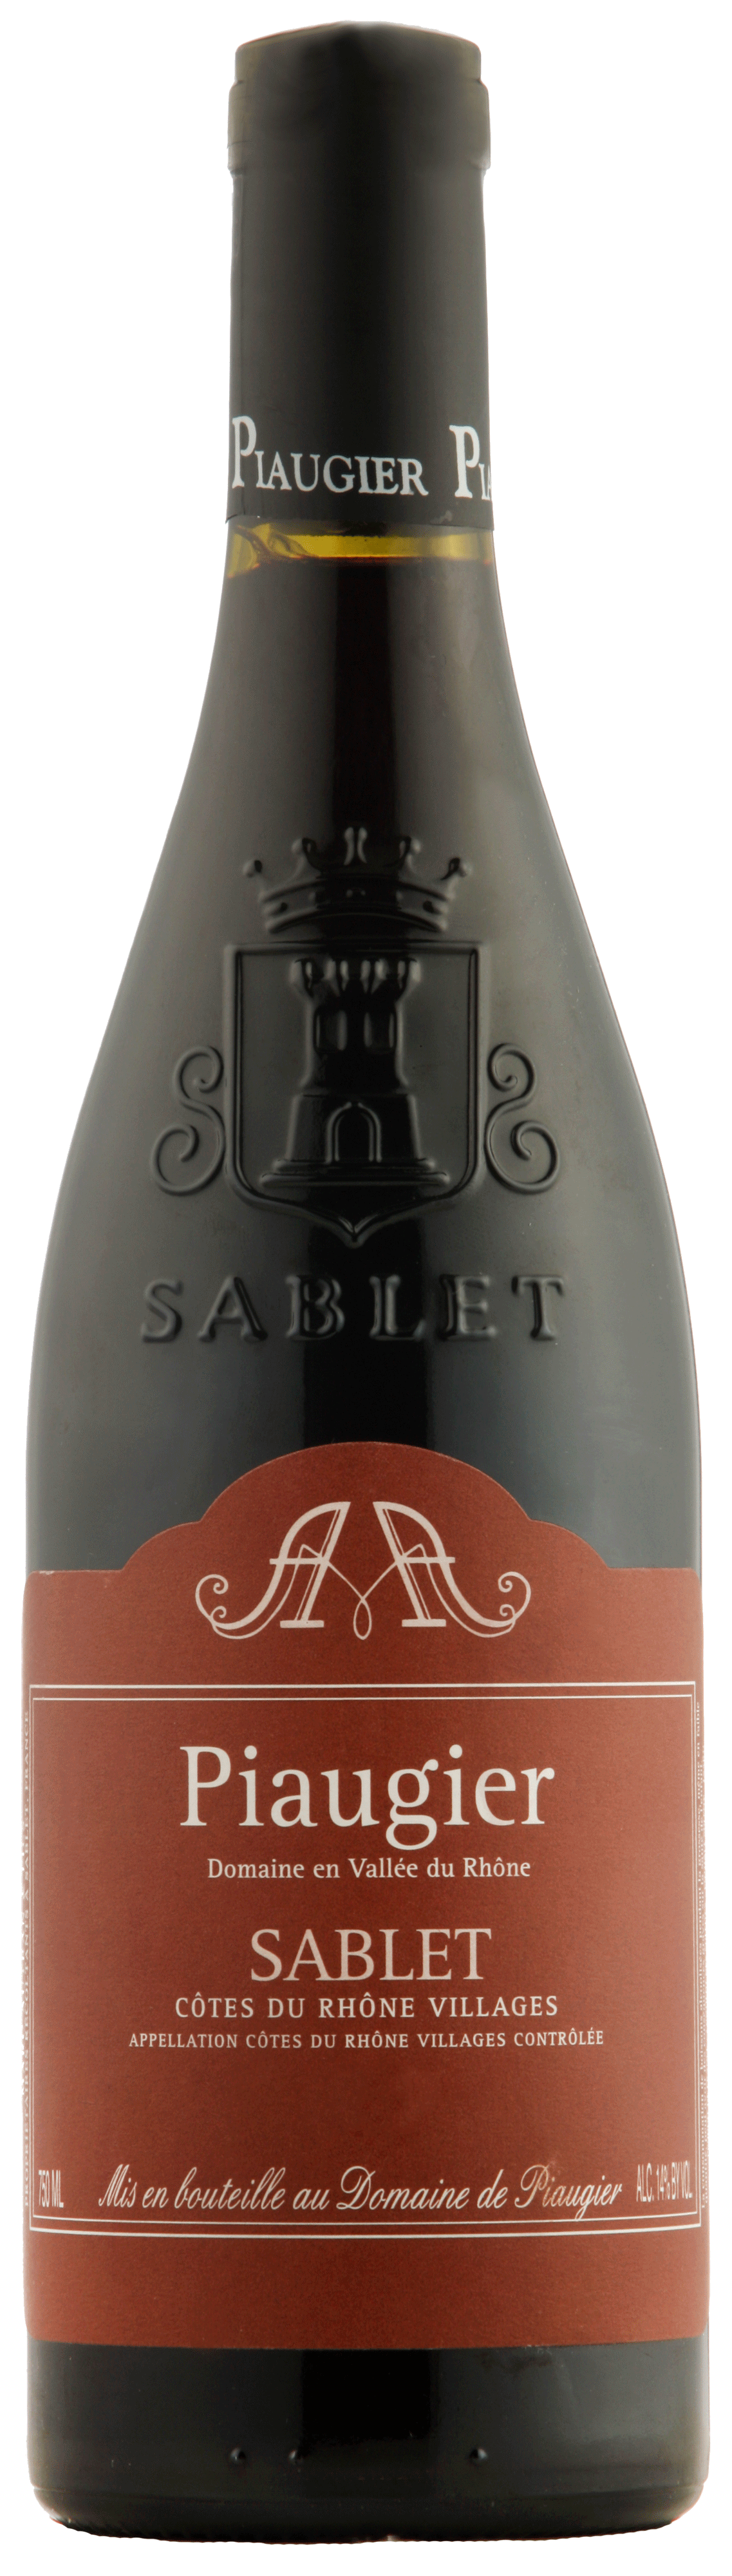 Sablet rouge, Côtes du Rhône-Villages.